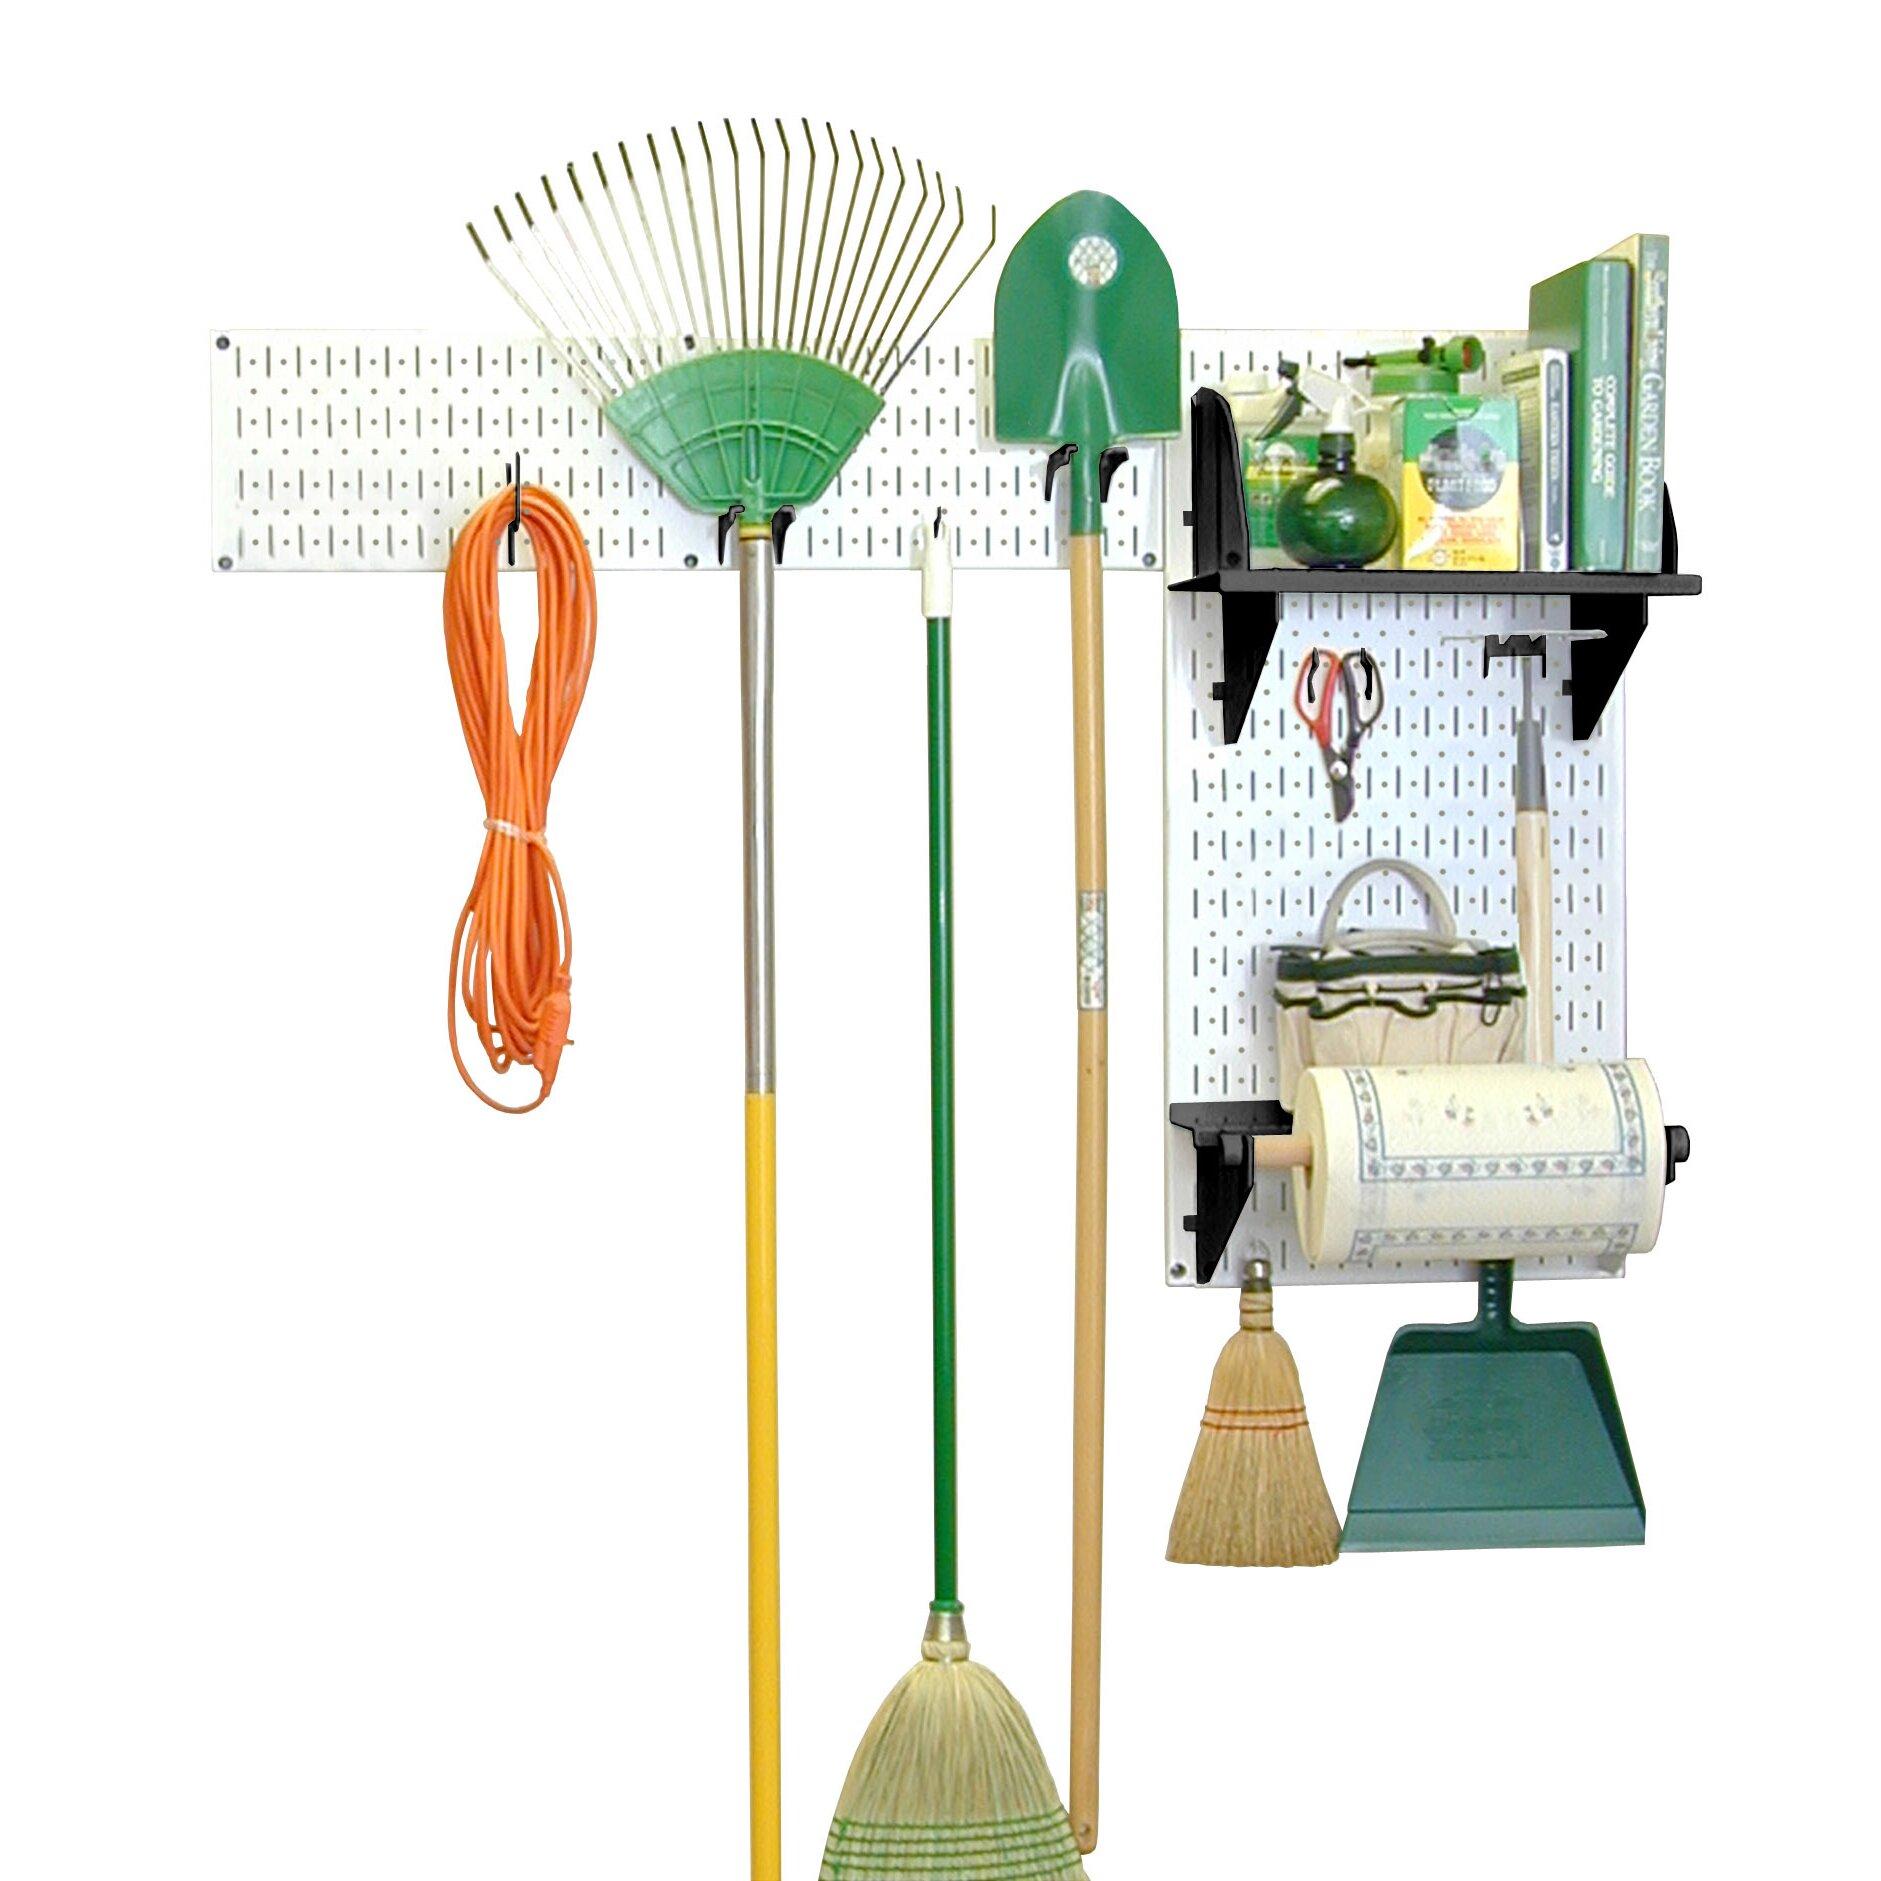 Wall control pegboard garden tool board organizer kit for Gardening tools organizer